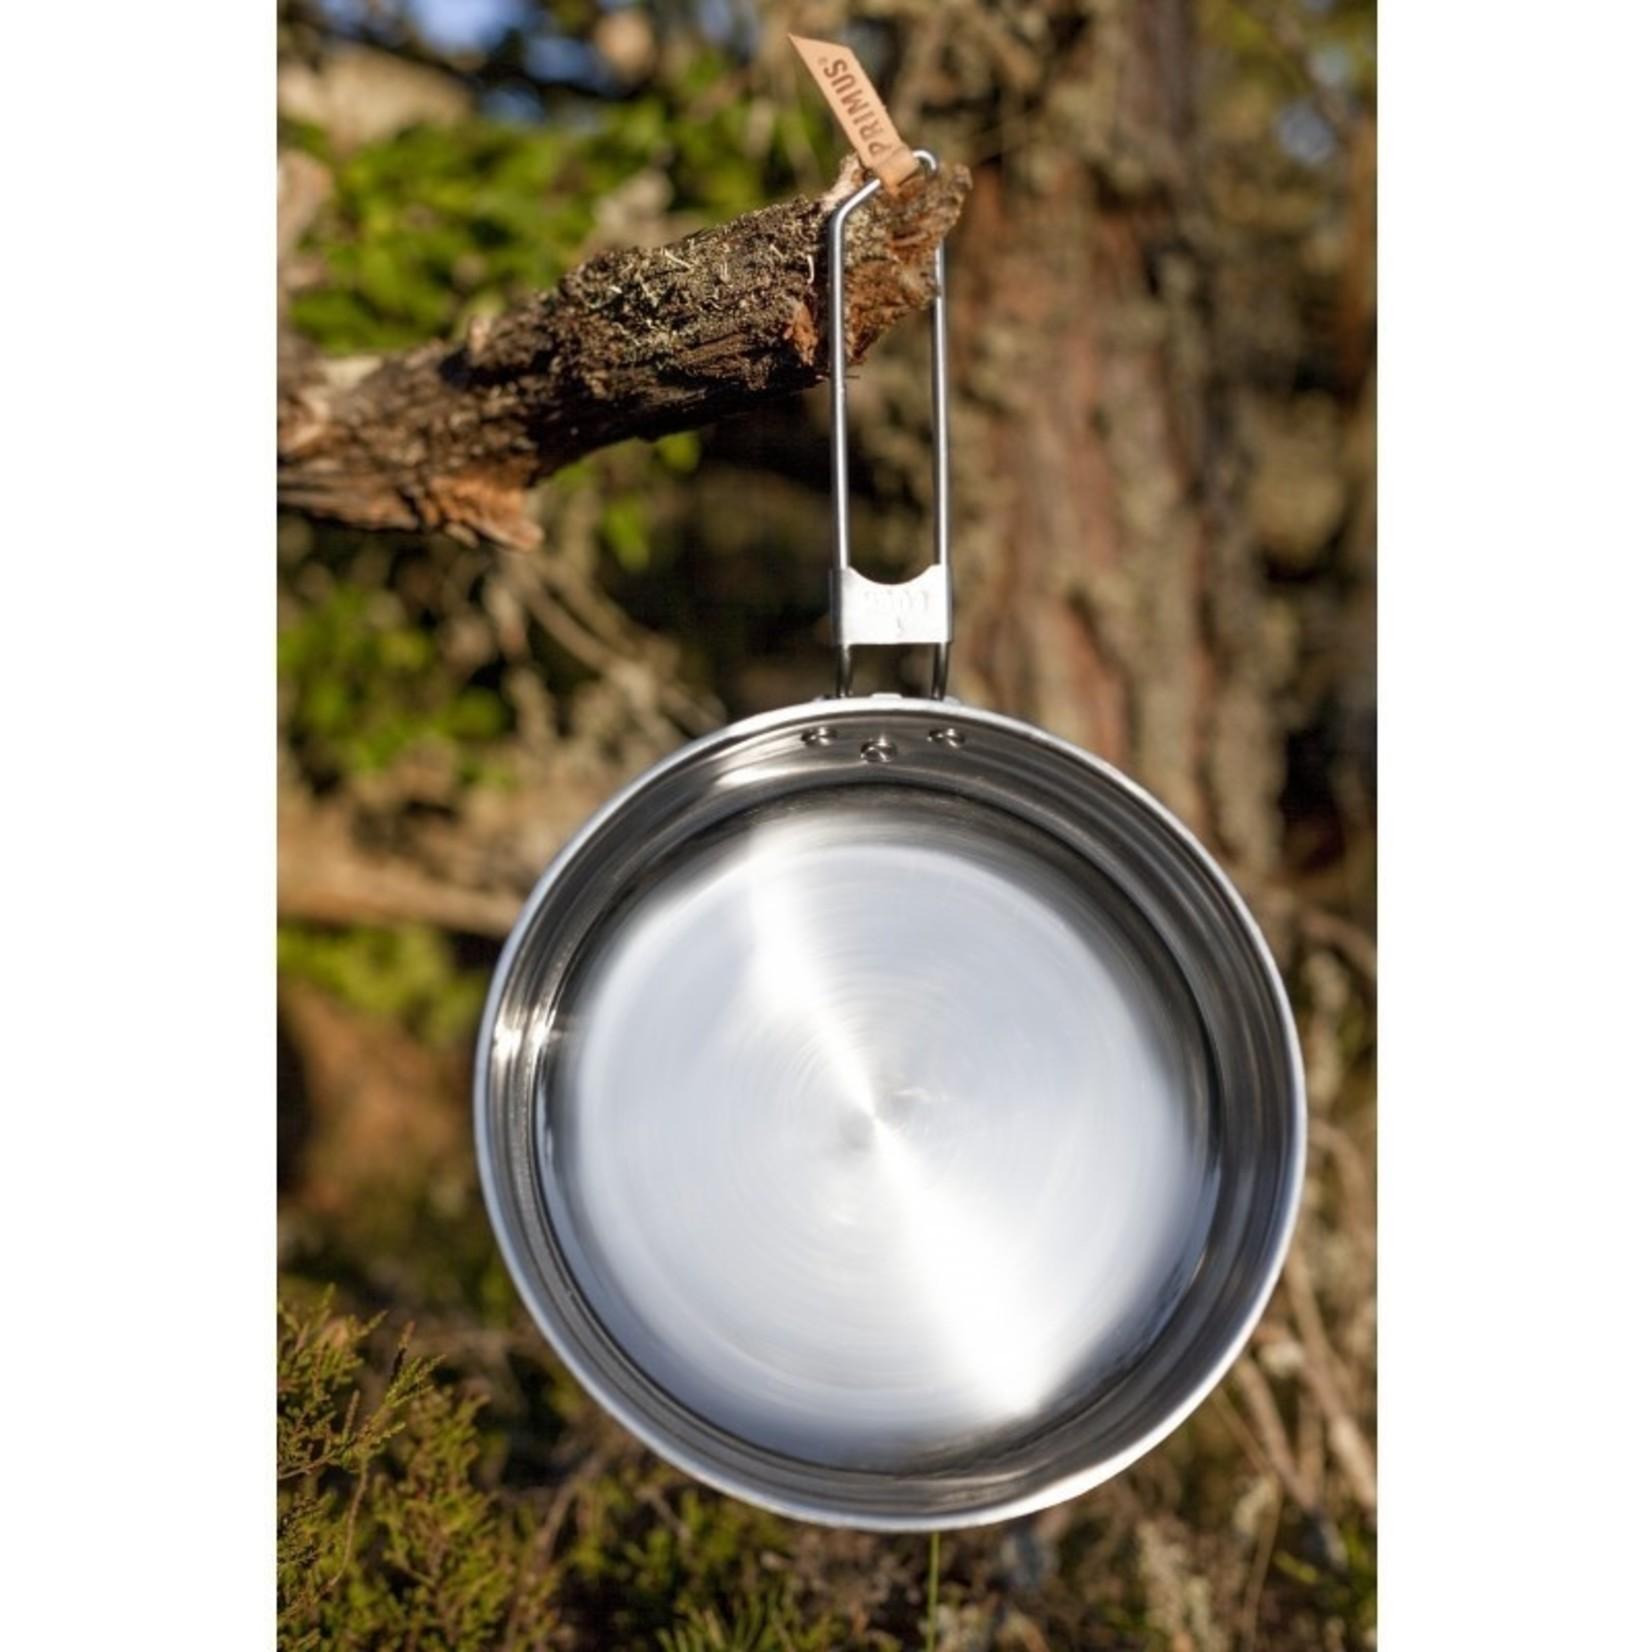 Primus Primus Campfire koekenpan 25 cm, BPA-vrij